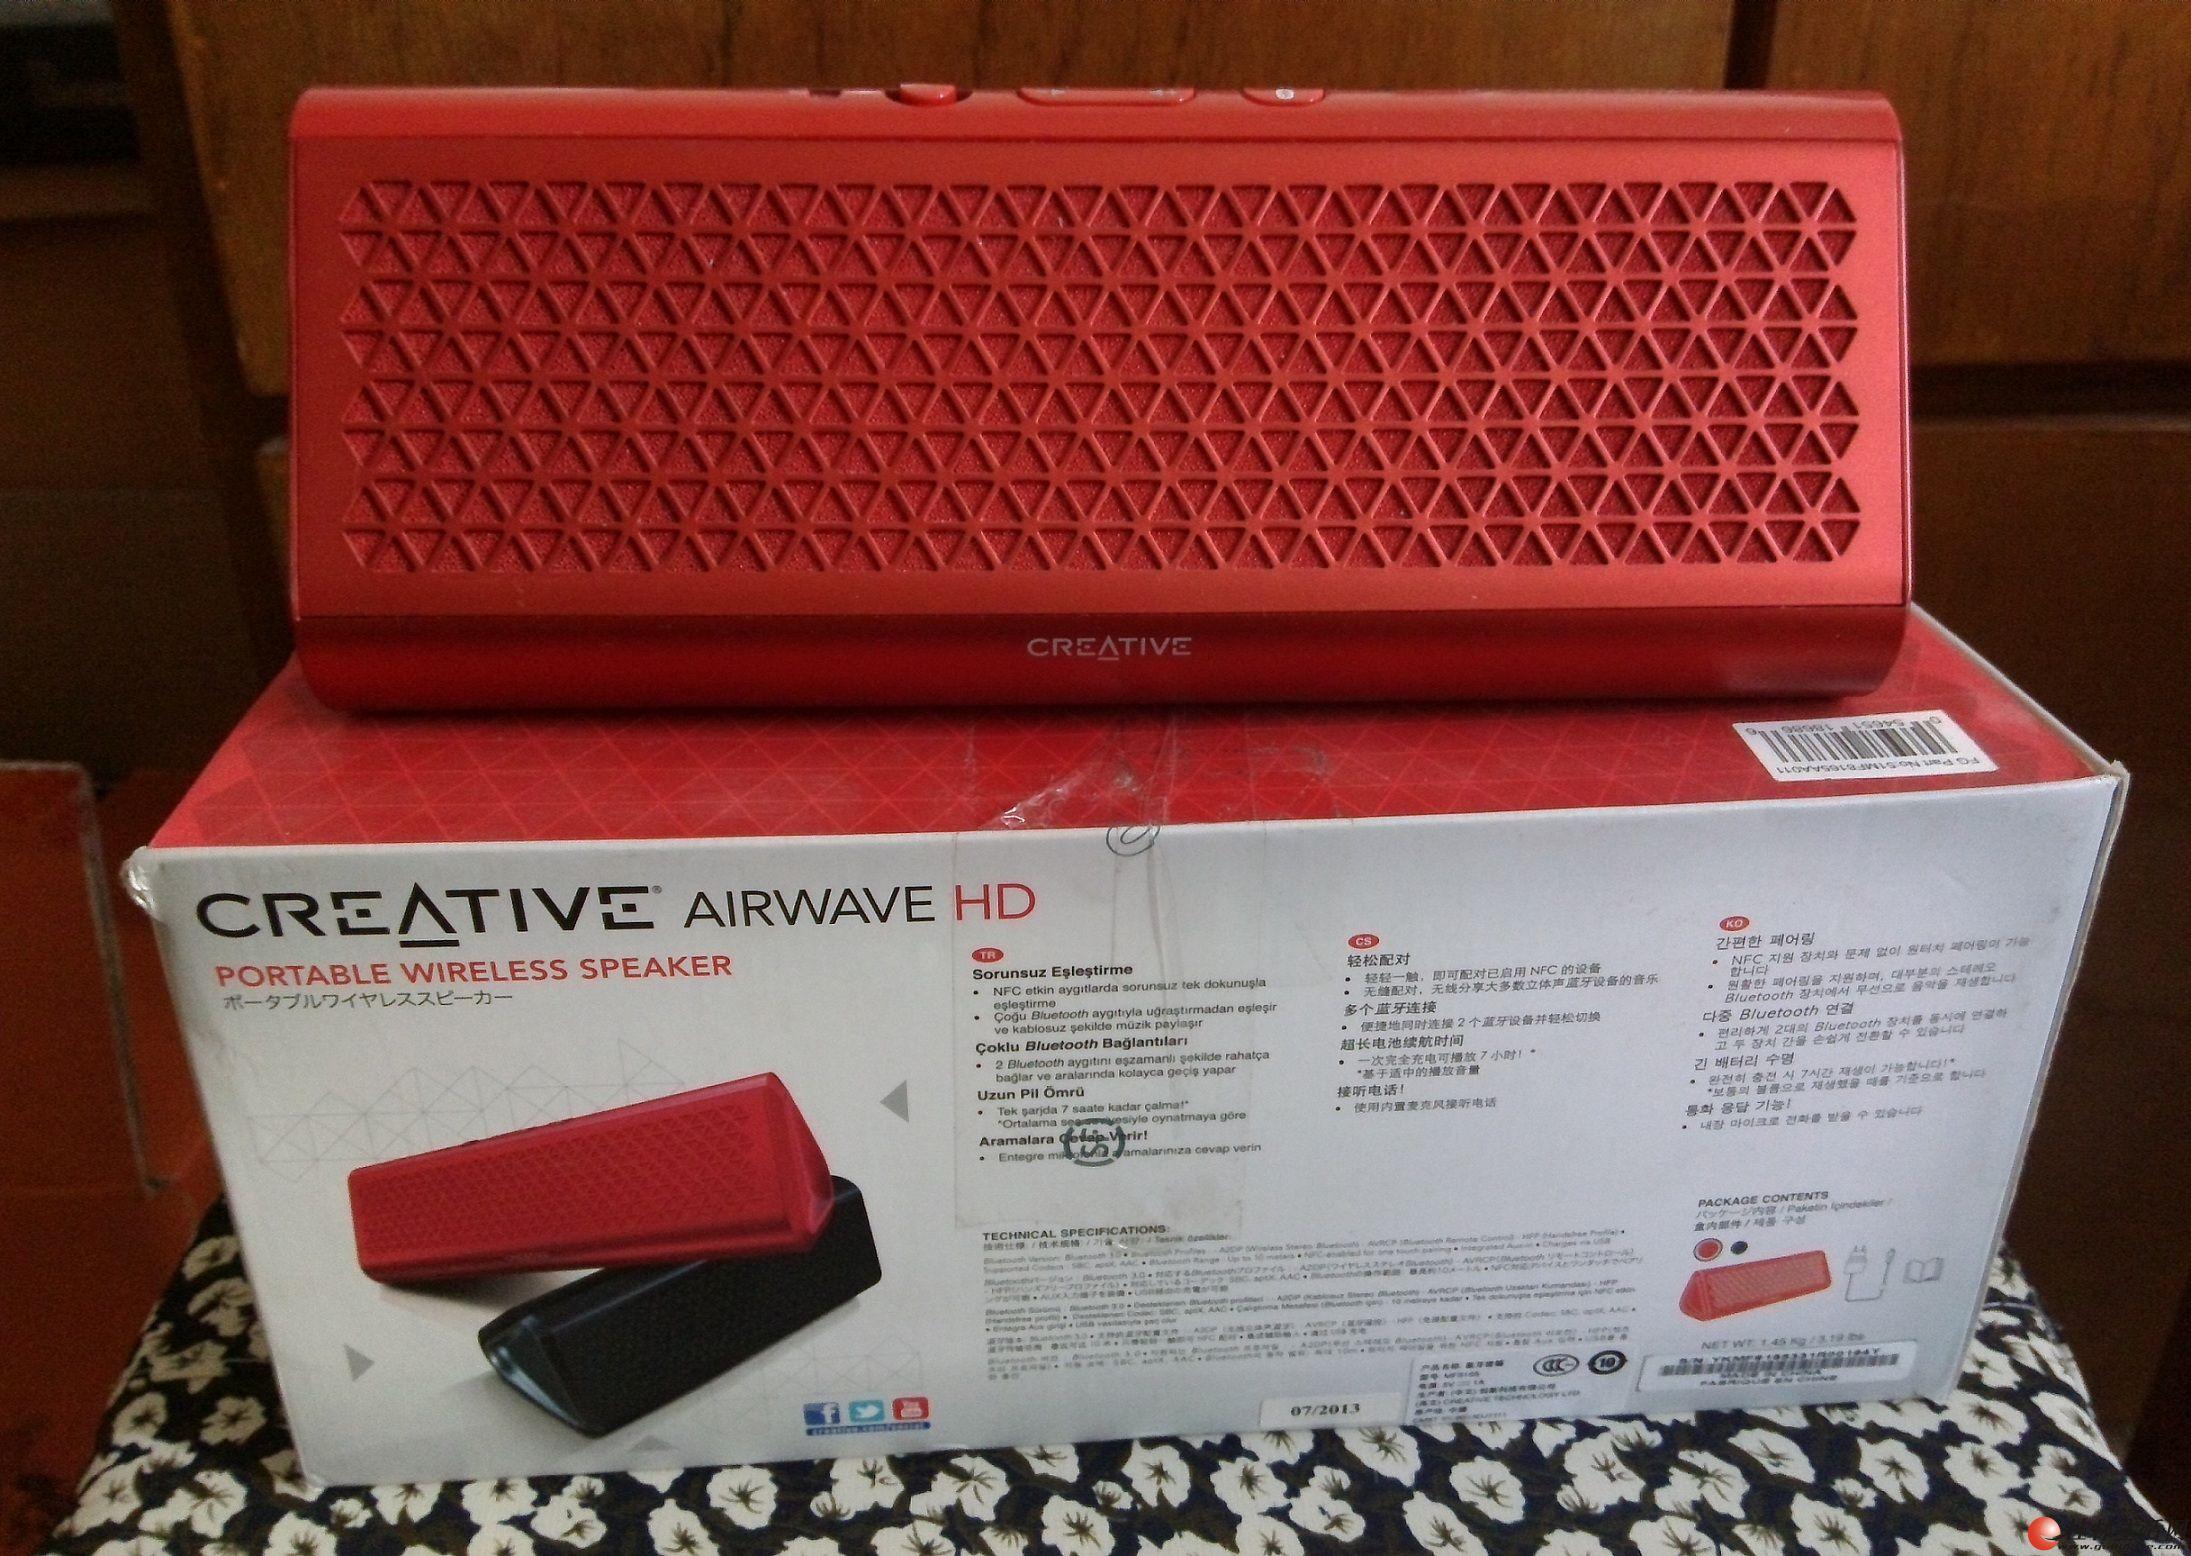 创新(Creative) Airwave HD 蓝牙无线音箱 红色